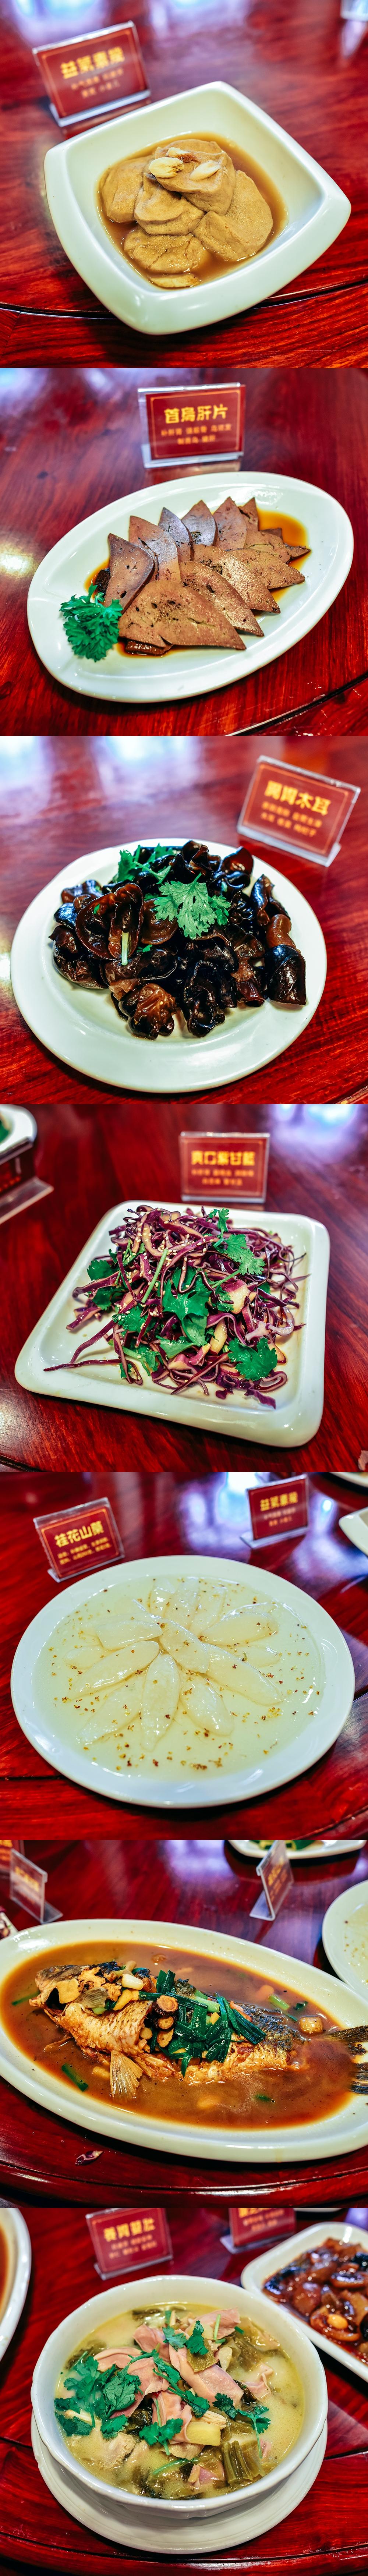 Hangzhou China Real Chinese Food Food Eat